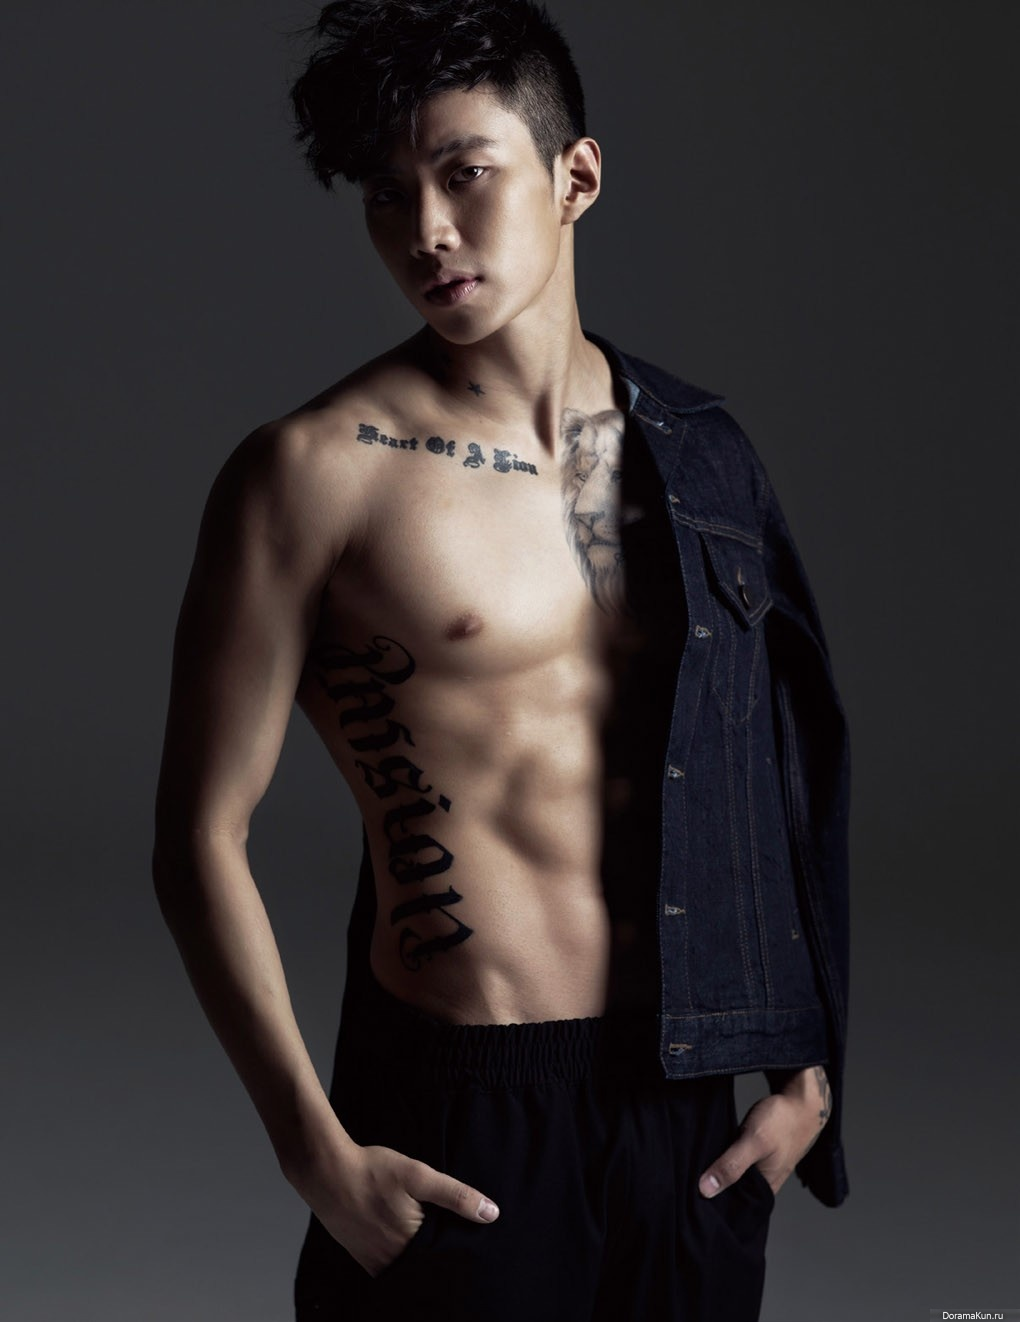 Jay bias photo gallery